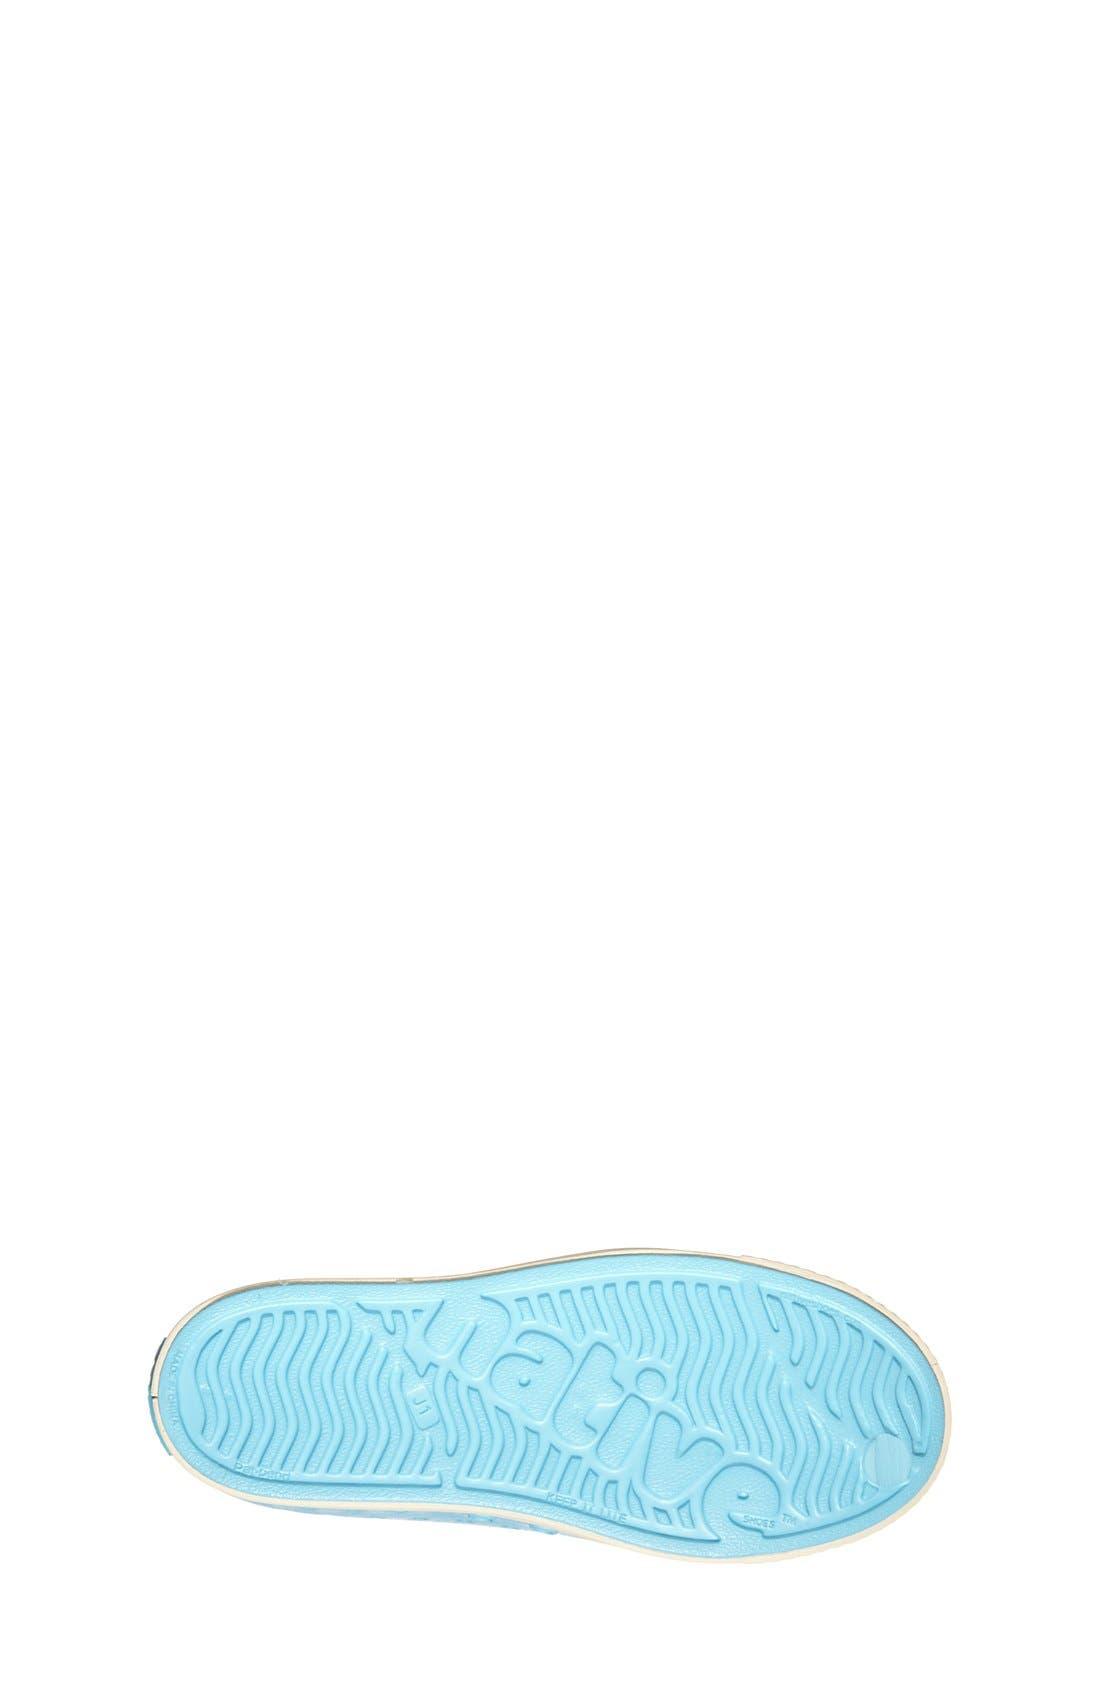 'Jefferson' Water Friendly Slip-On Sneaker,                             Alternate thumbnail 101, color,